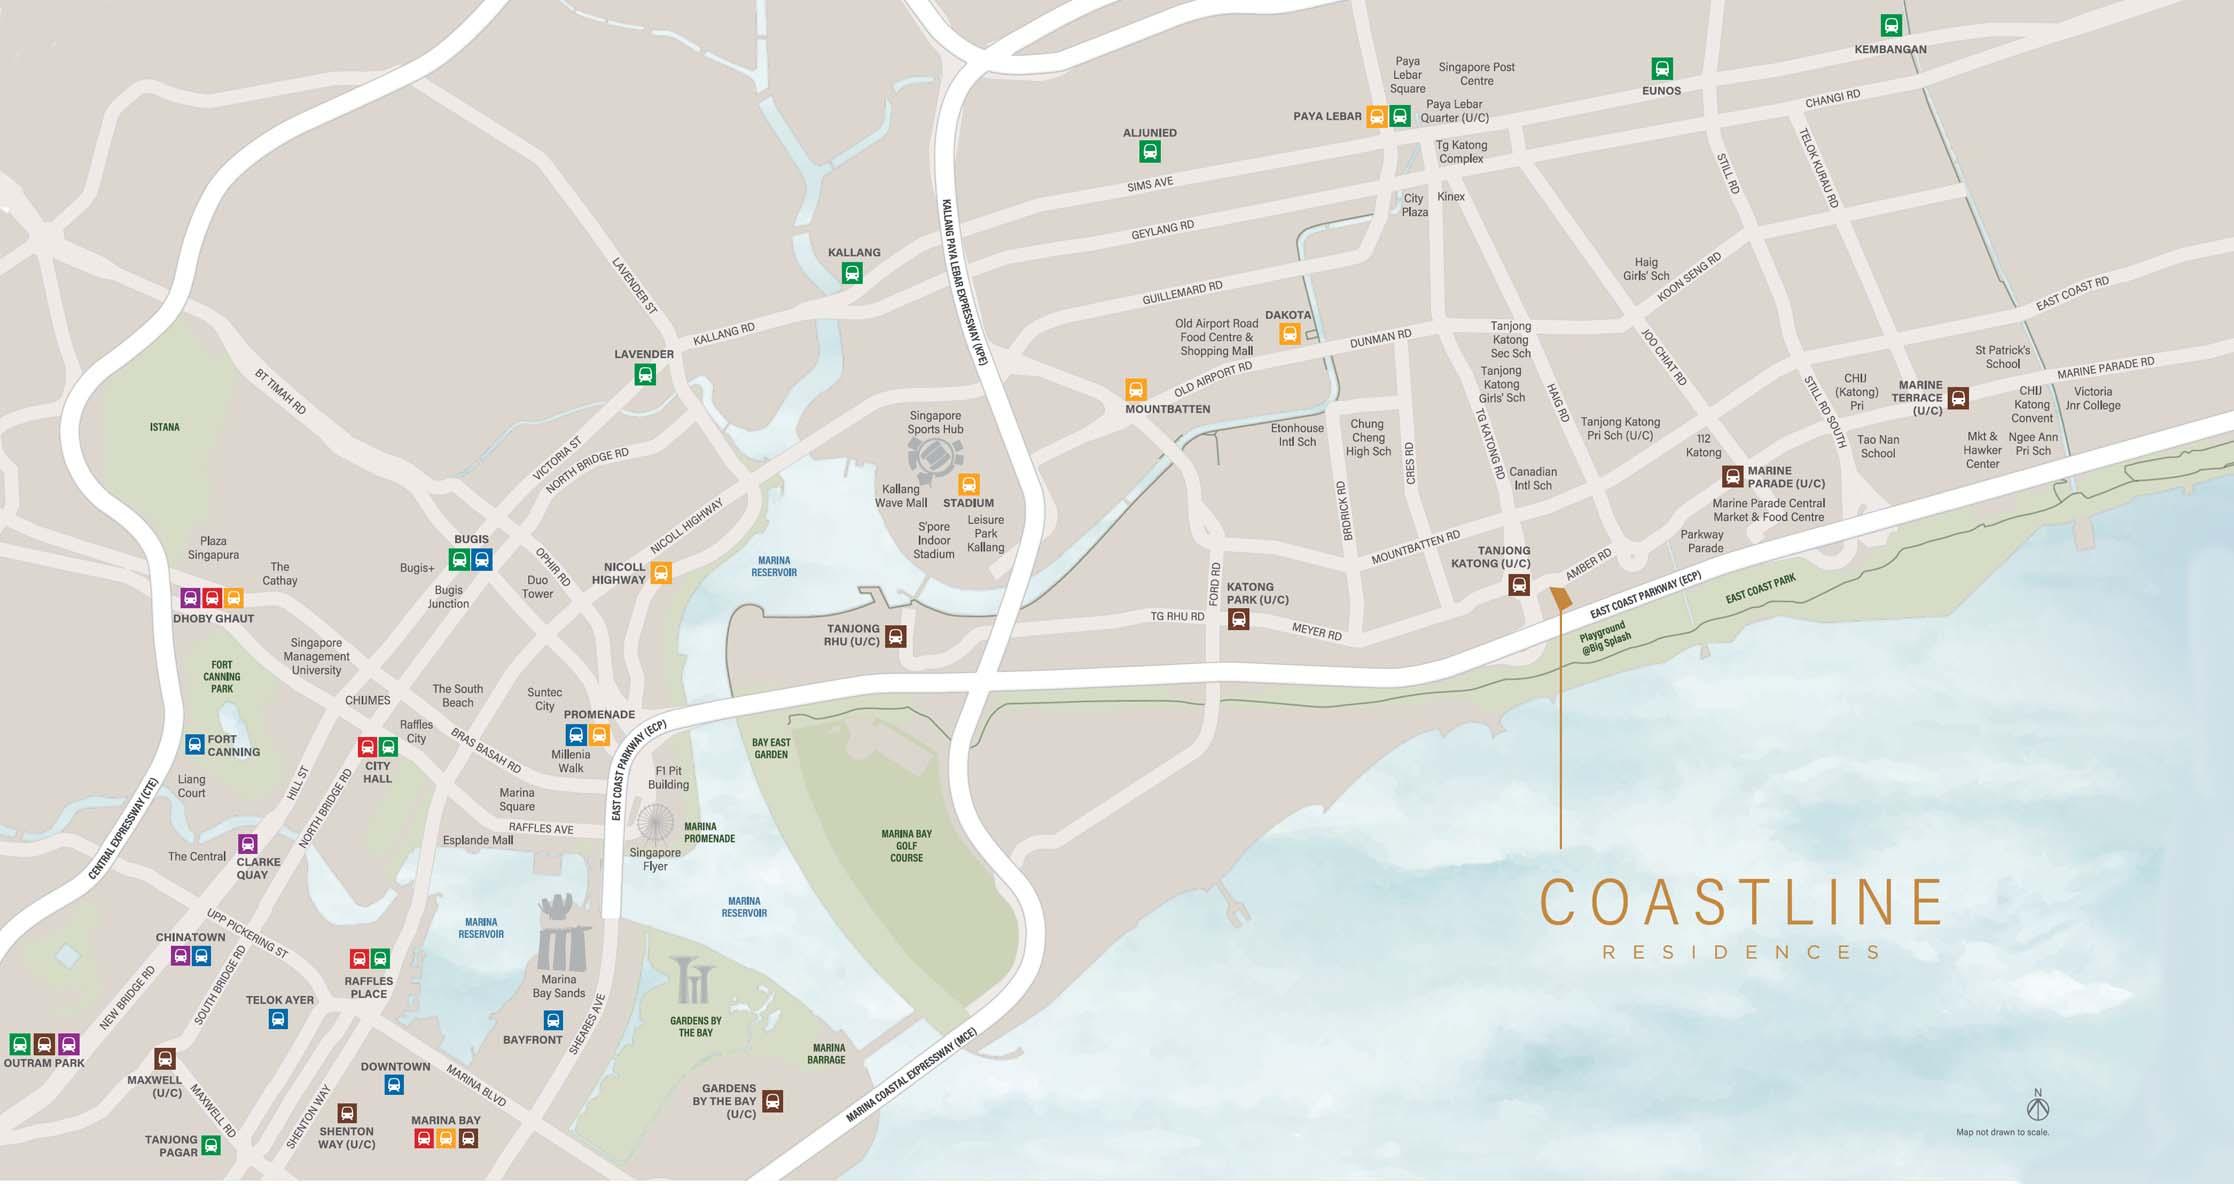 Coastline-Residences-Location-Map